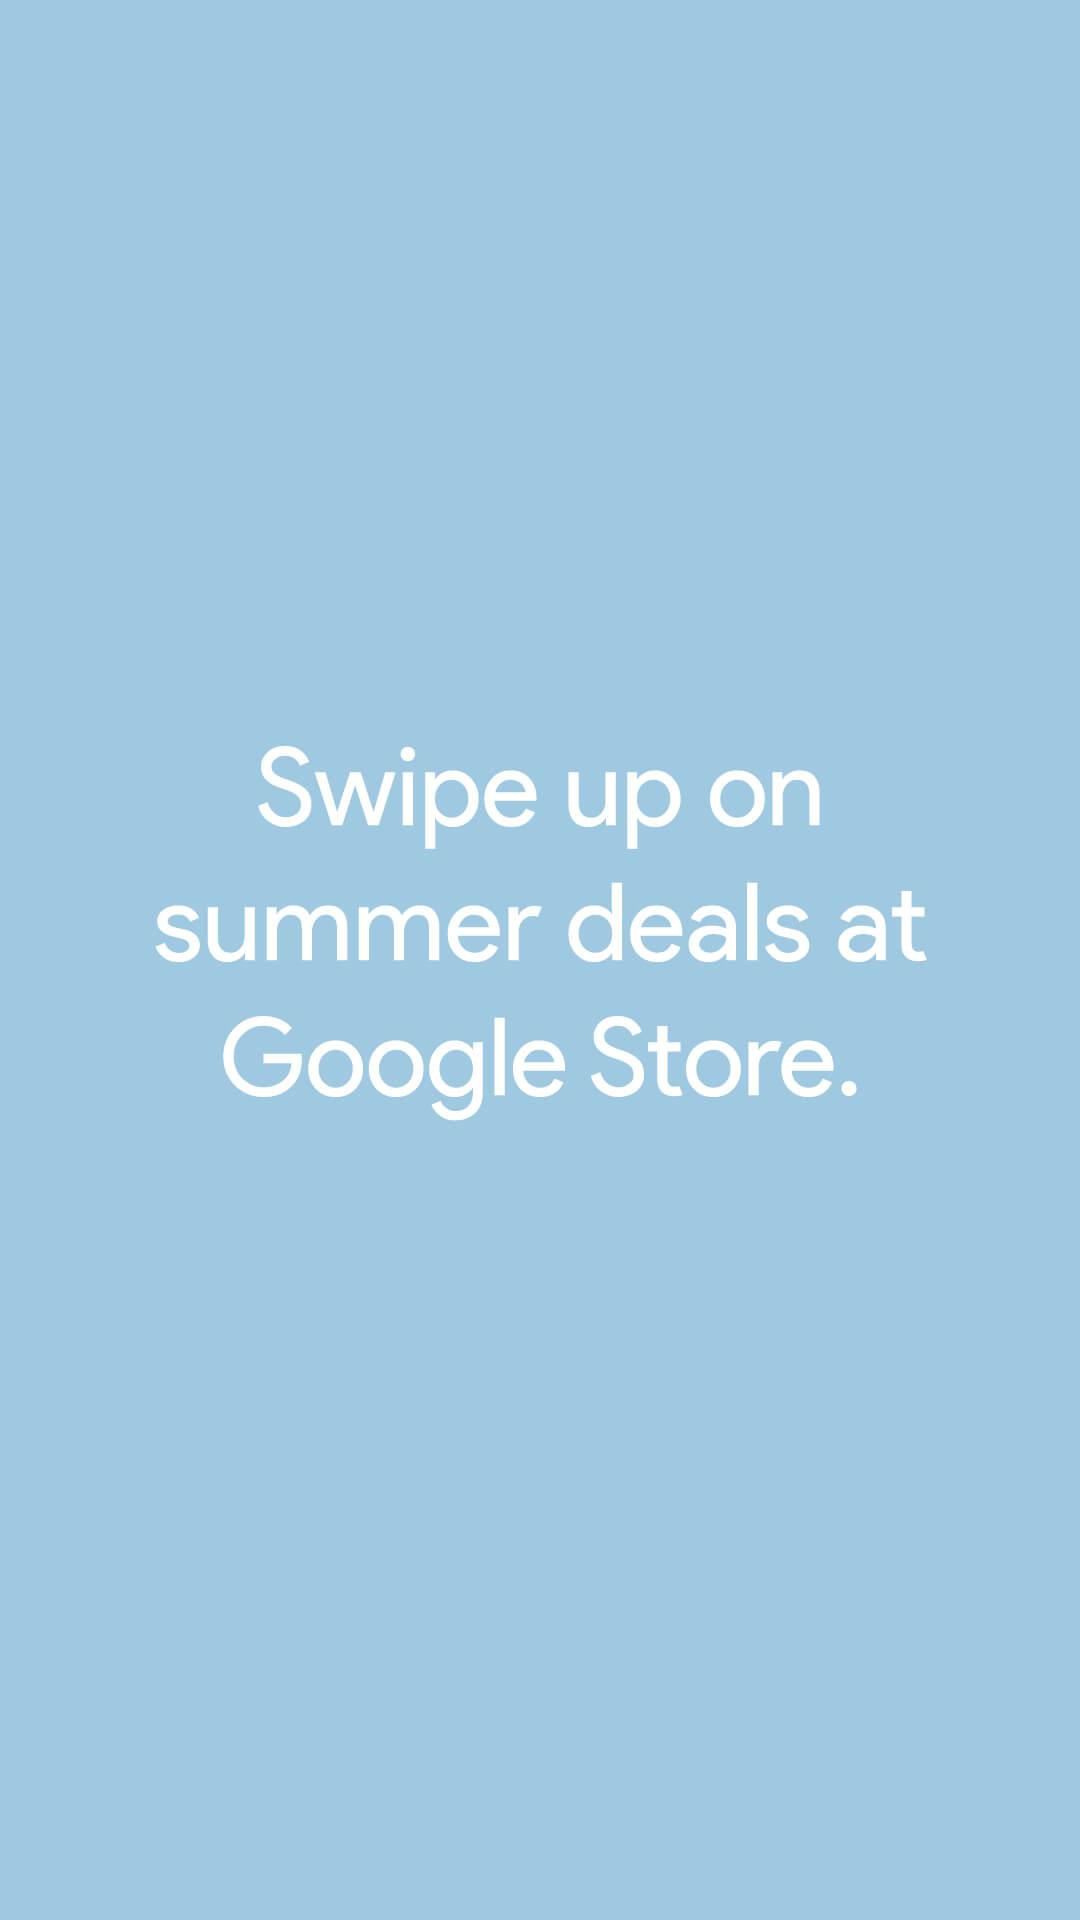 GoogleStore_Story_GoogleSans-05